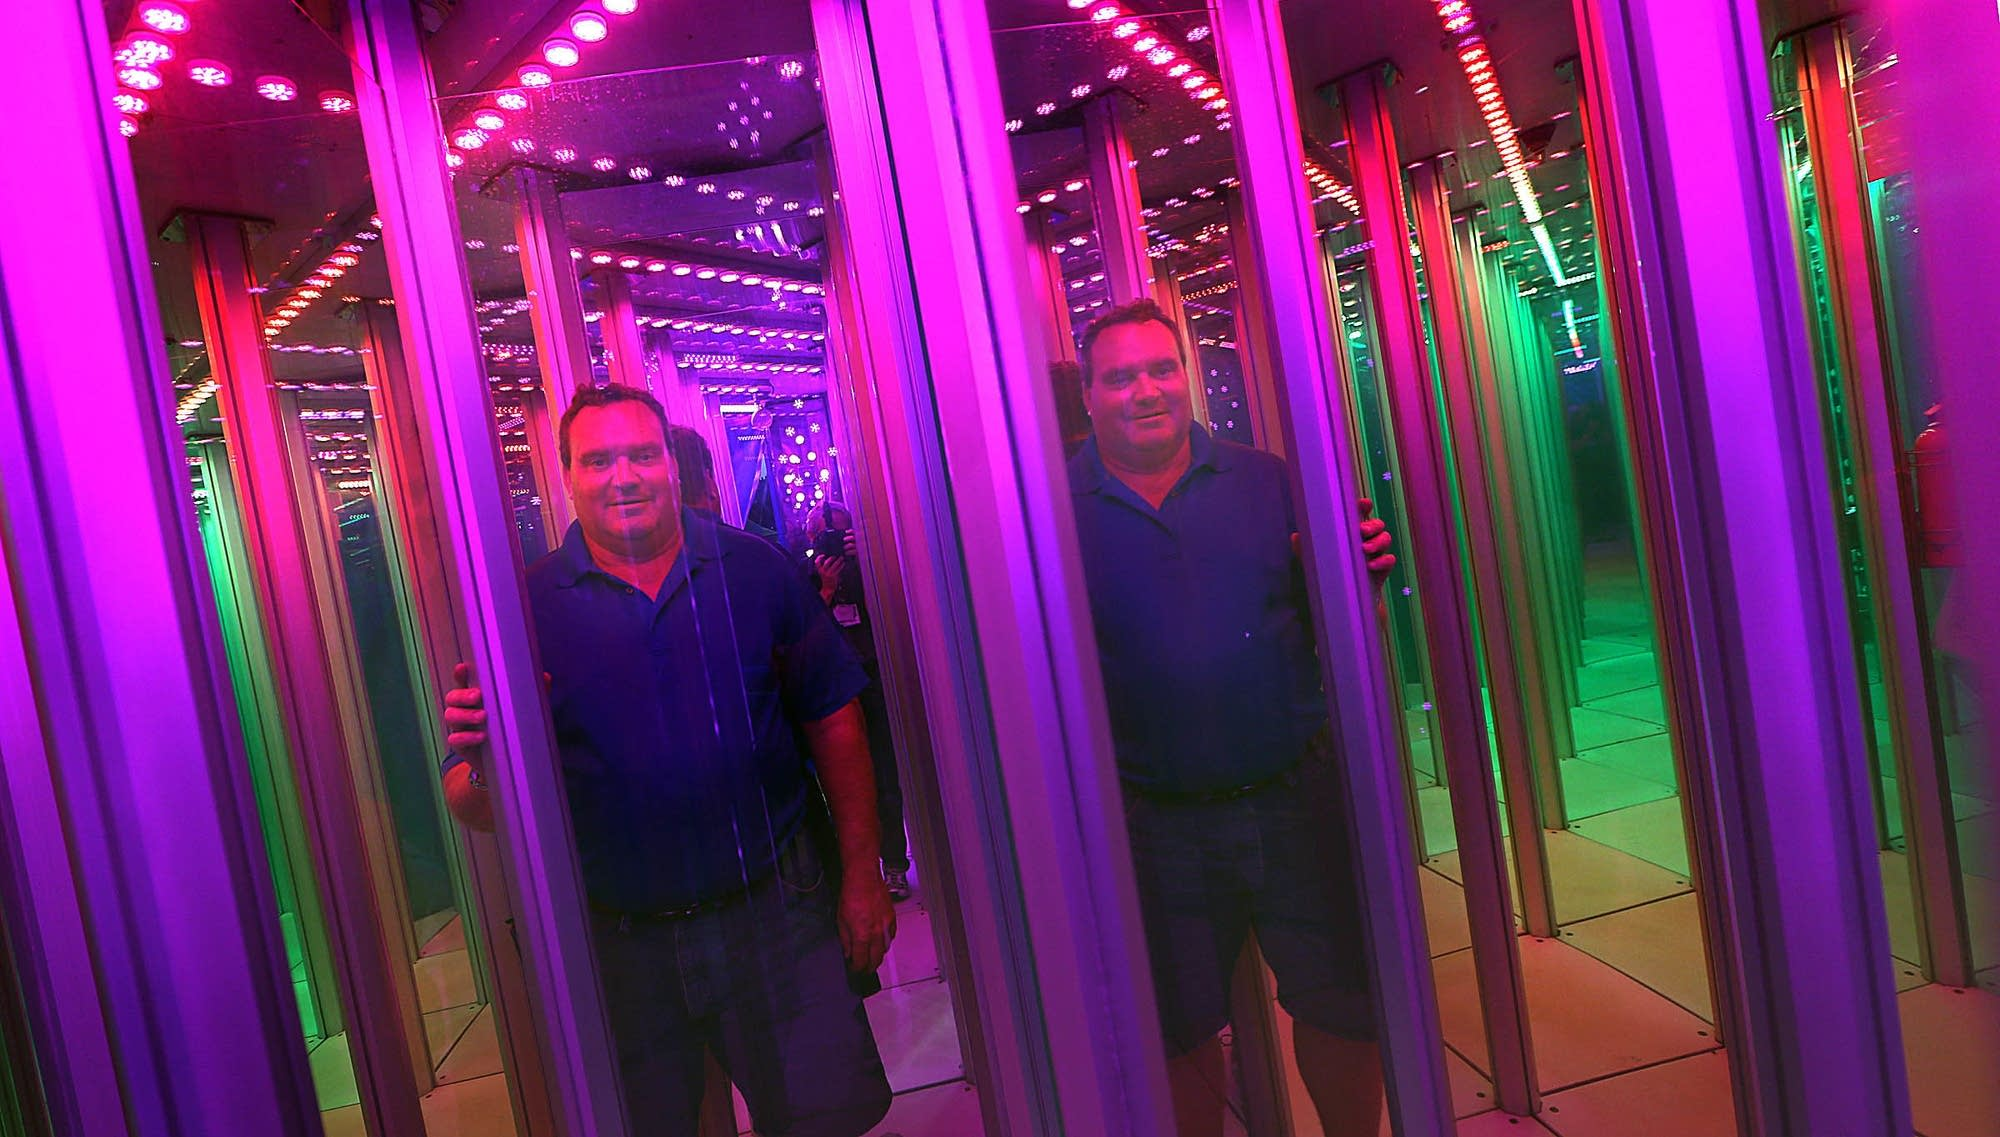 Michael Wood standing inside the Magic Maze.